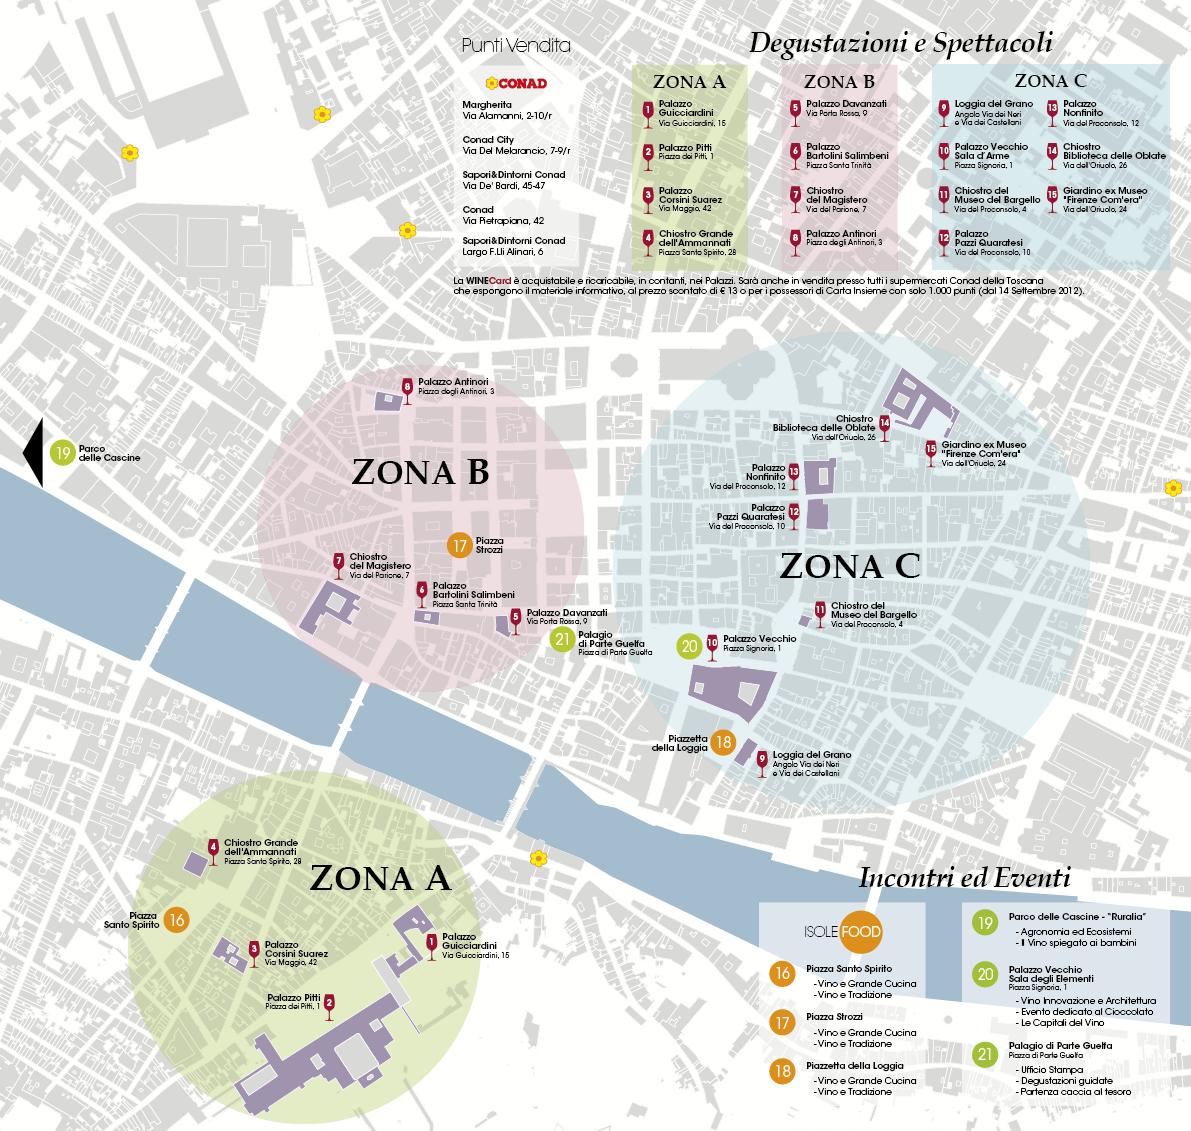 Firenze Cartina Centro Storico.Mappa Winetown Con Parcheggi Florence Parking Florence Parking Parcheggiare A Firenze